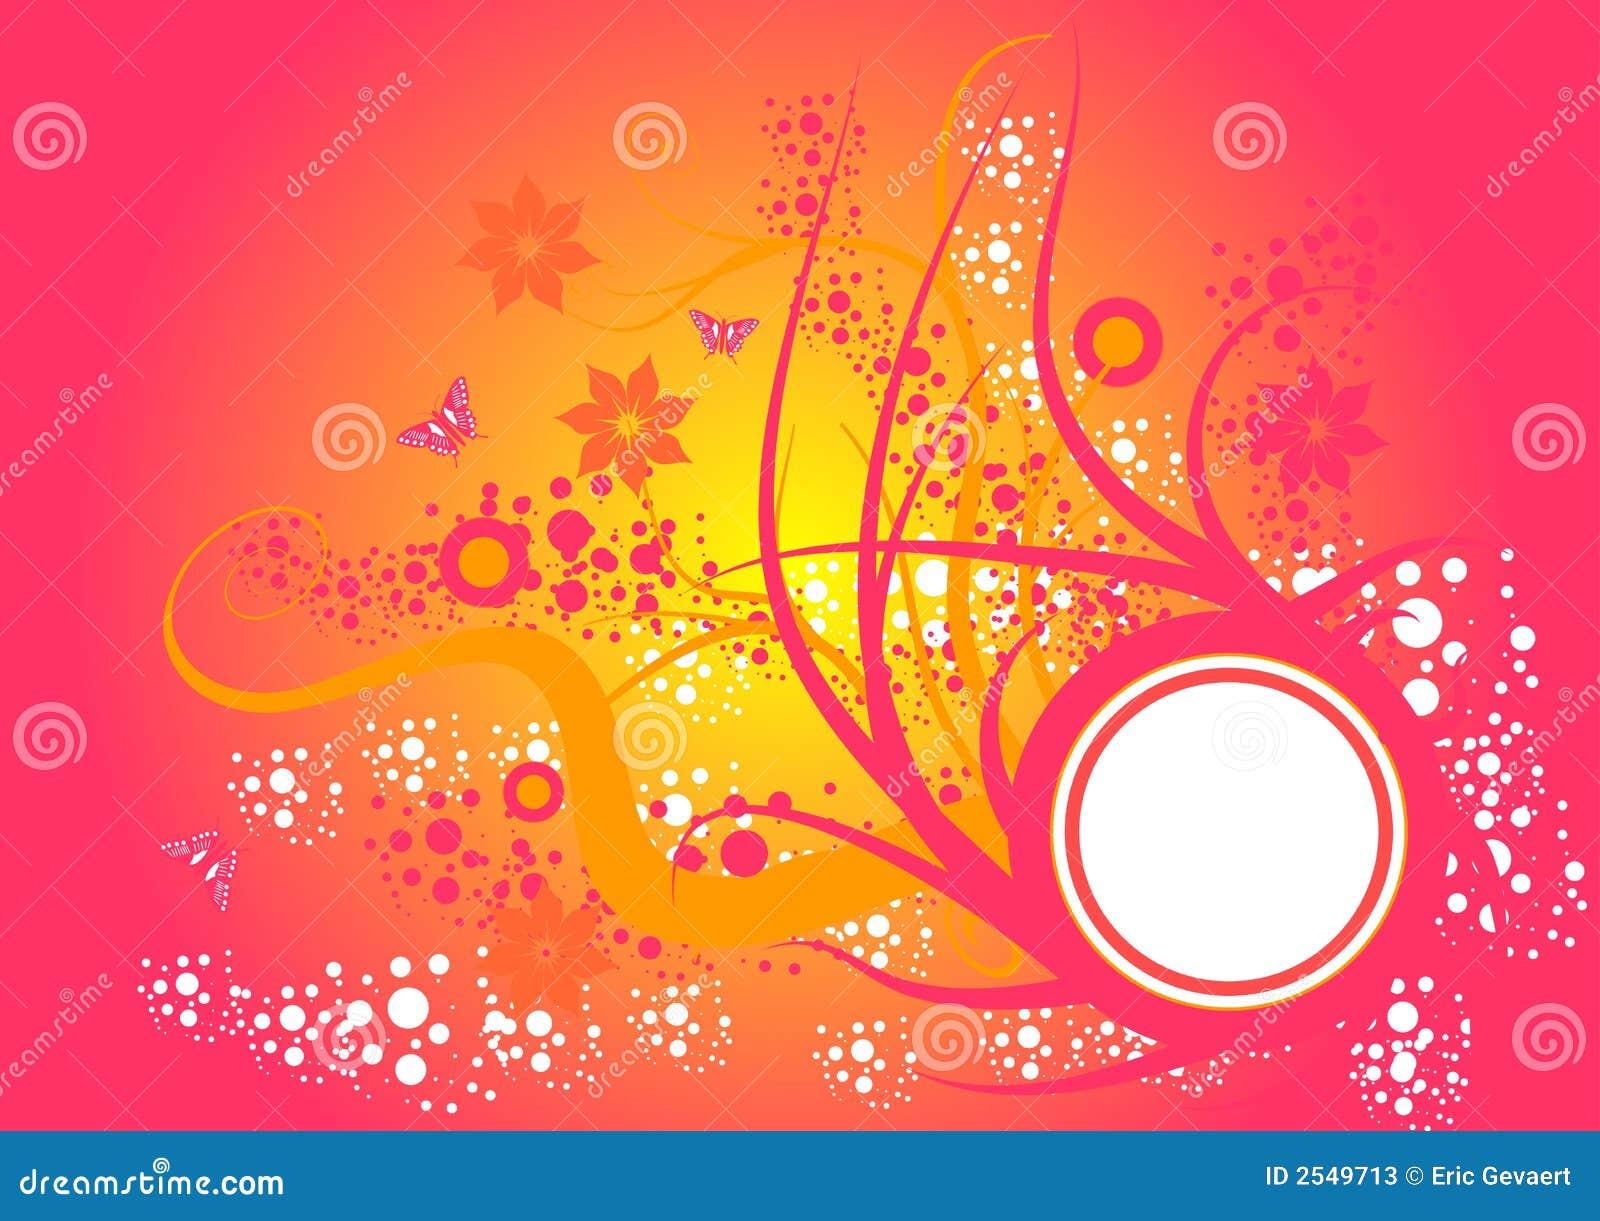 Trendy Vector Floral Design Stock Vector Image 2549713